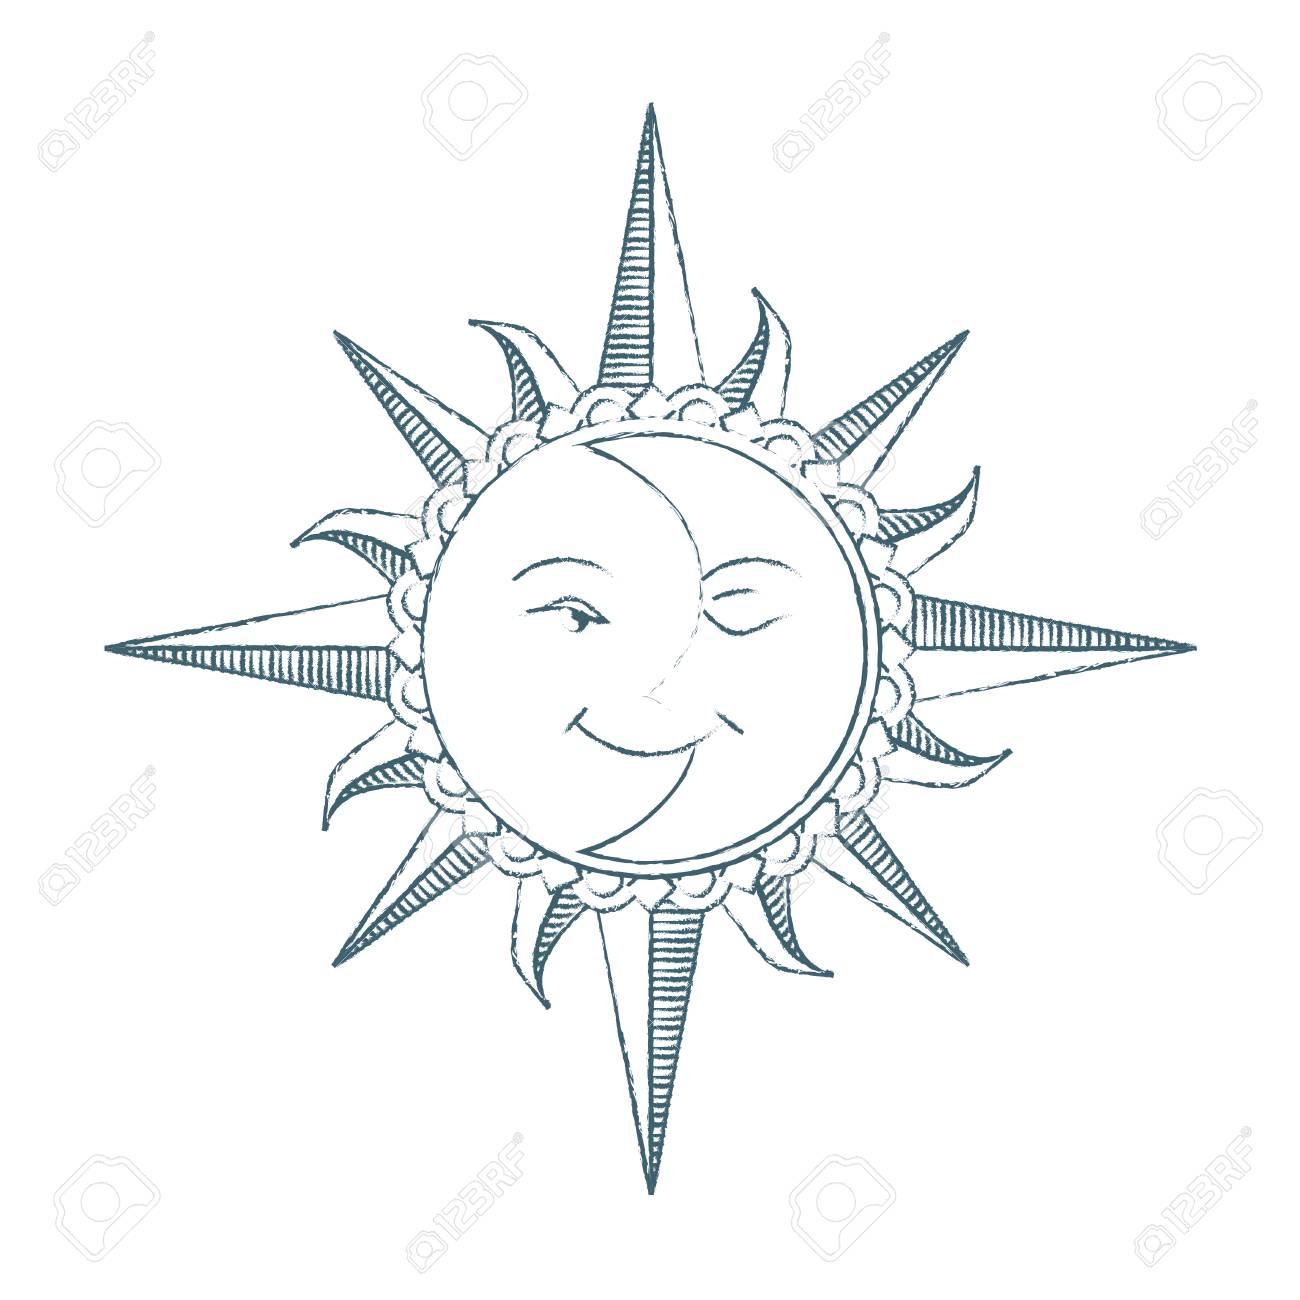 1300x1300 Vintage Style Hand Drawn Sun And Moon. Alchemy Symbol. Tattoo